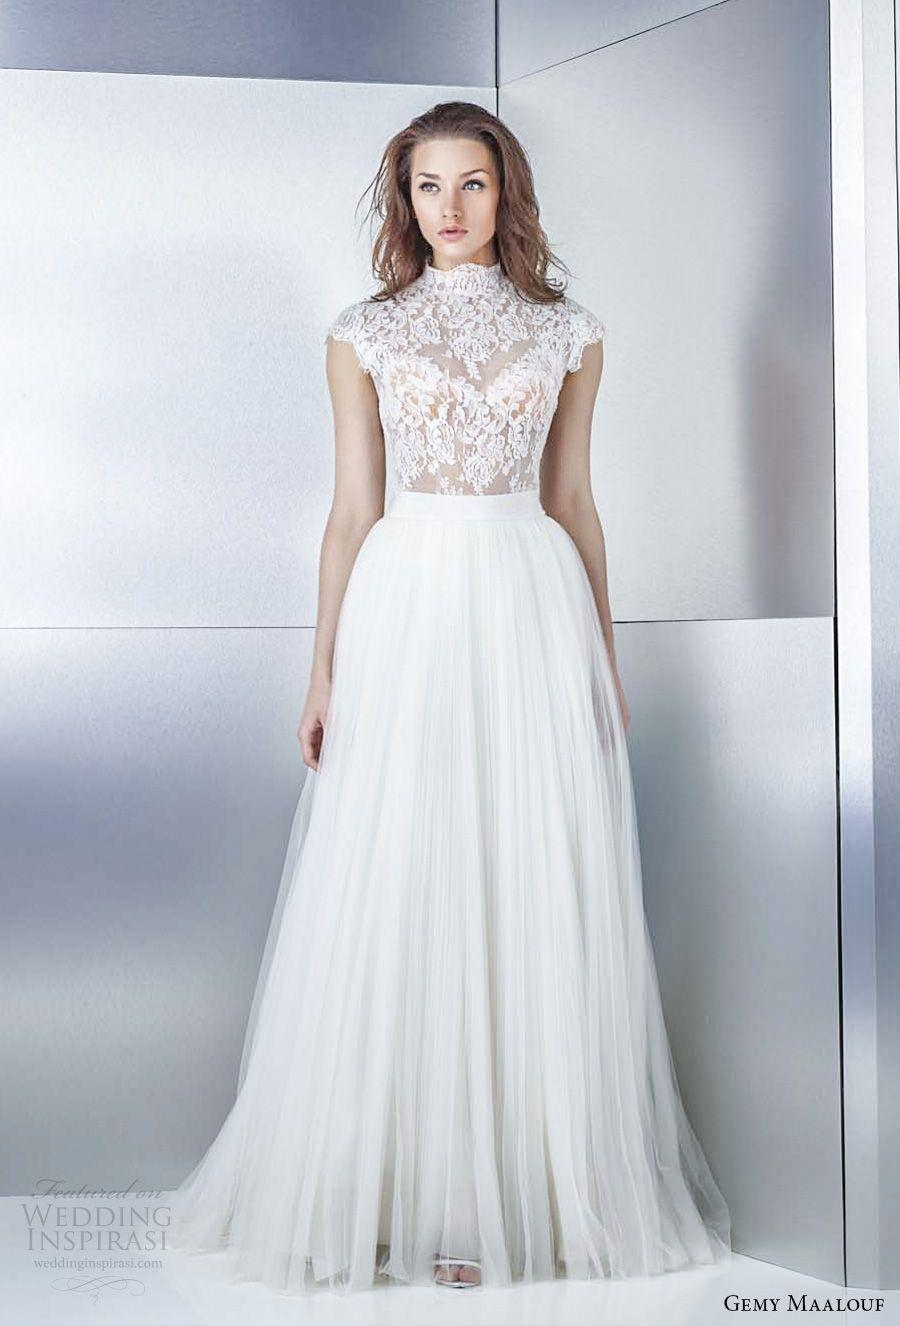 Gemy maalouf wedding dresses wedding dress pinterest